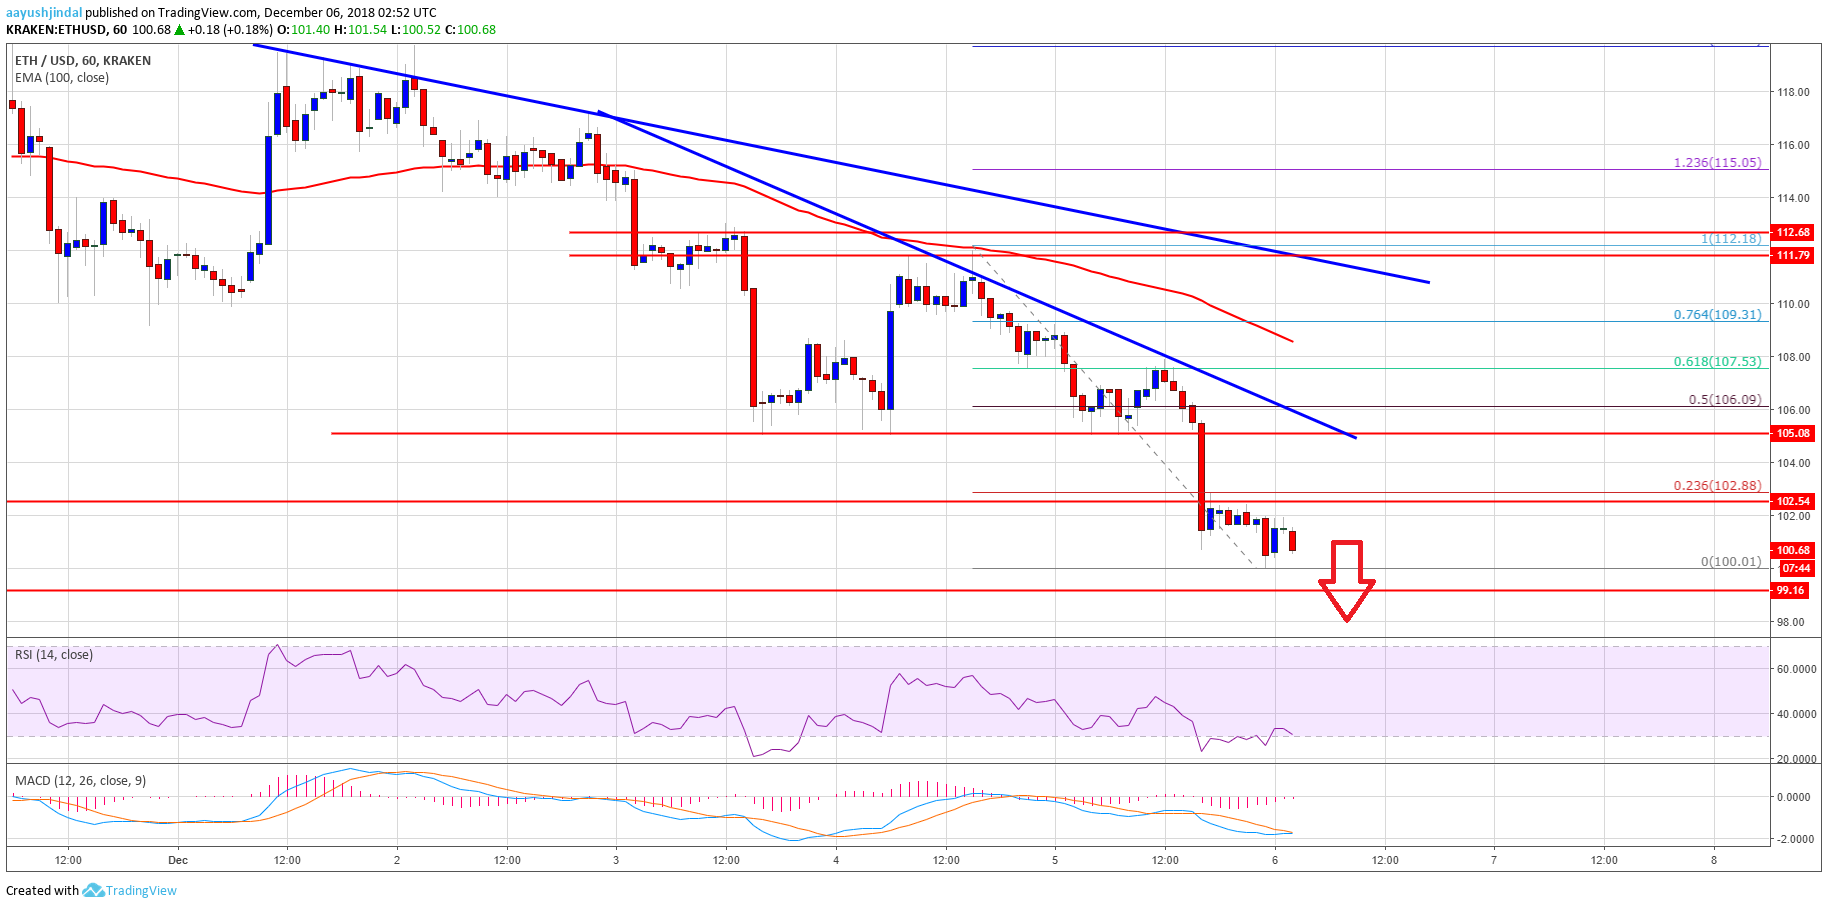 Ethereum Price Analysis: ETH/USD's Massive Breakdown Below $100